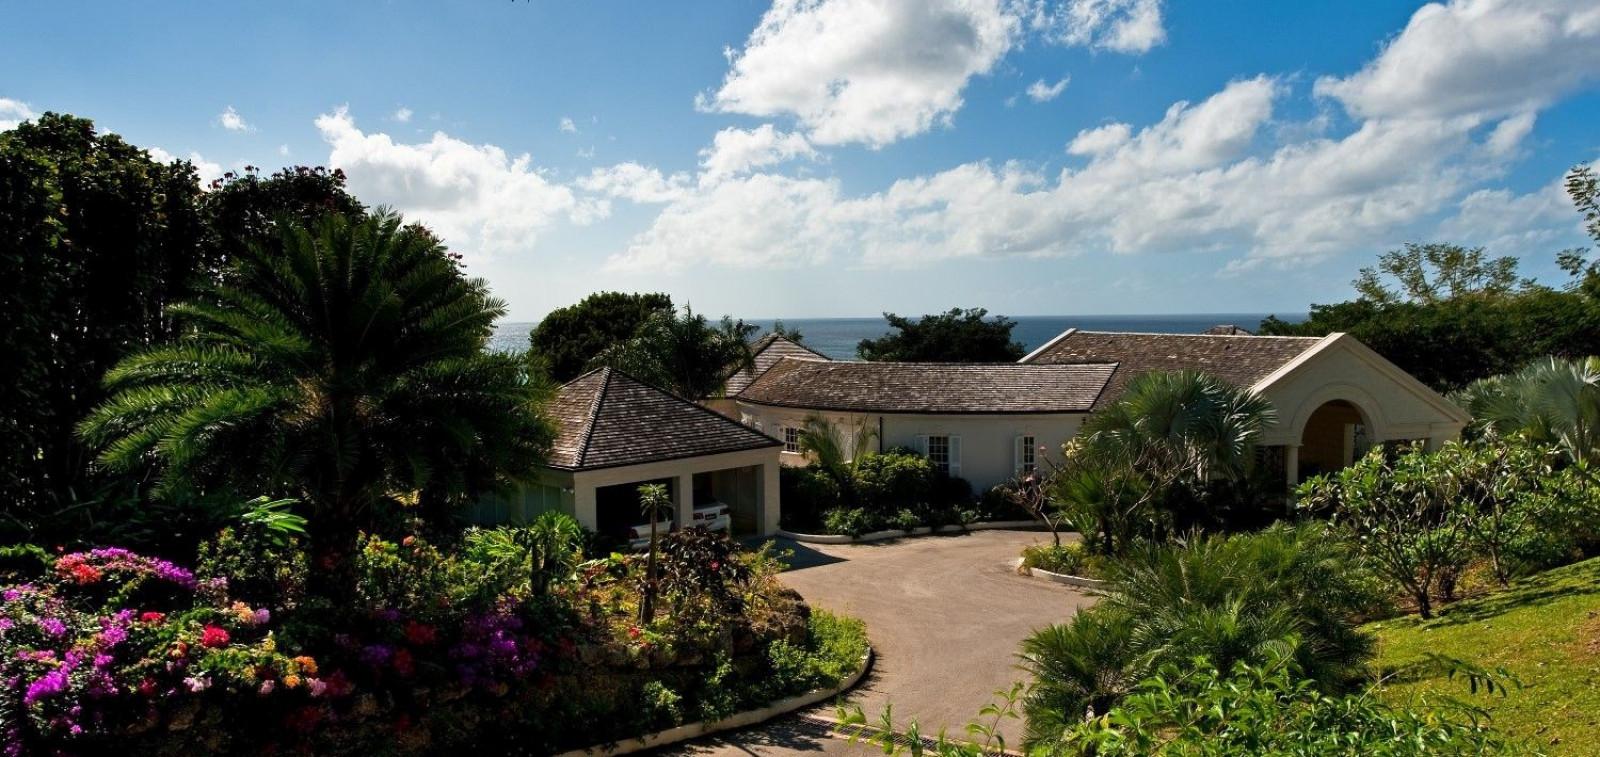 Luxury Gardens 5 Bedroom Villa Sugar Hill, Barbados with Private Pool, Putting Green & Sea Views